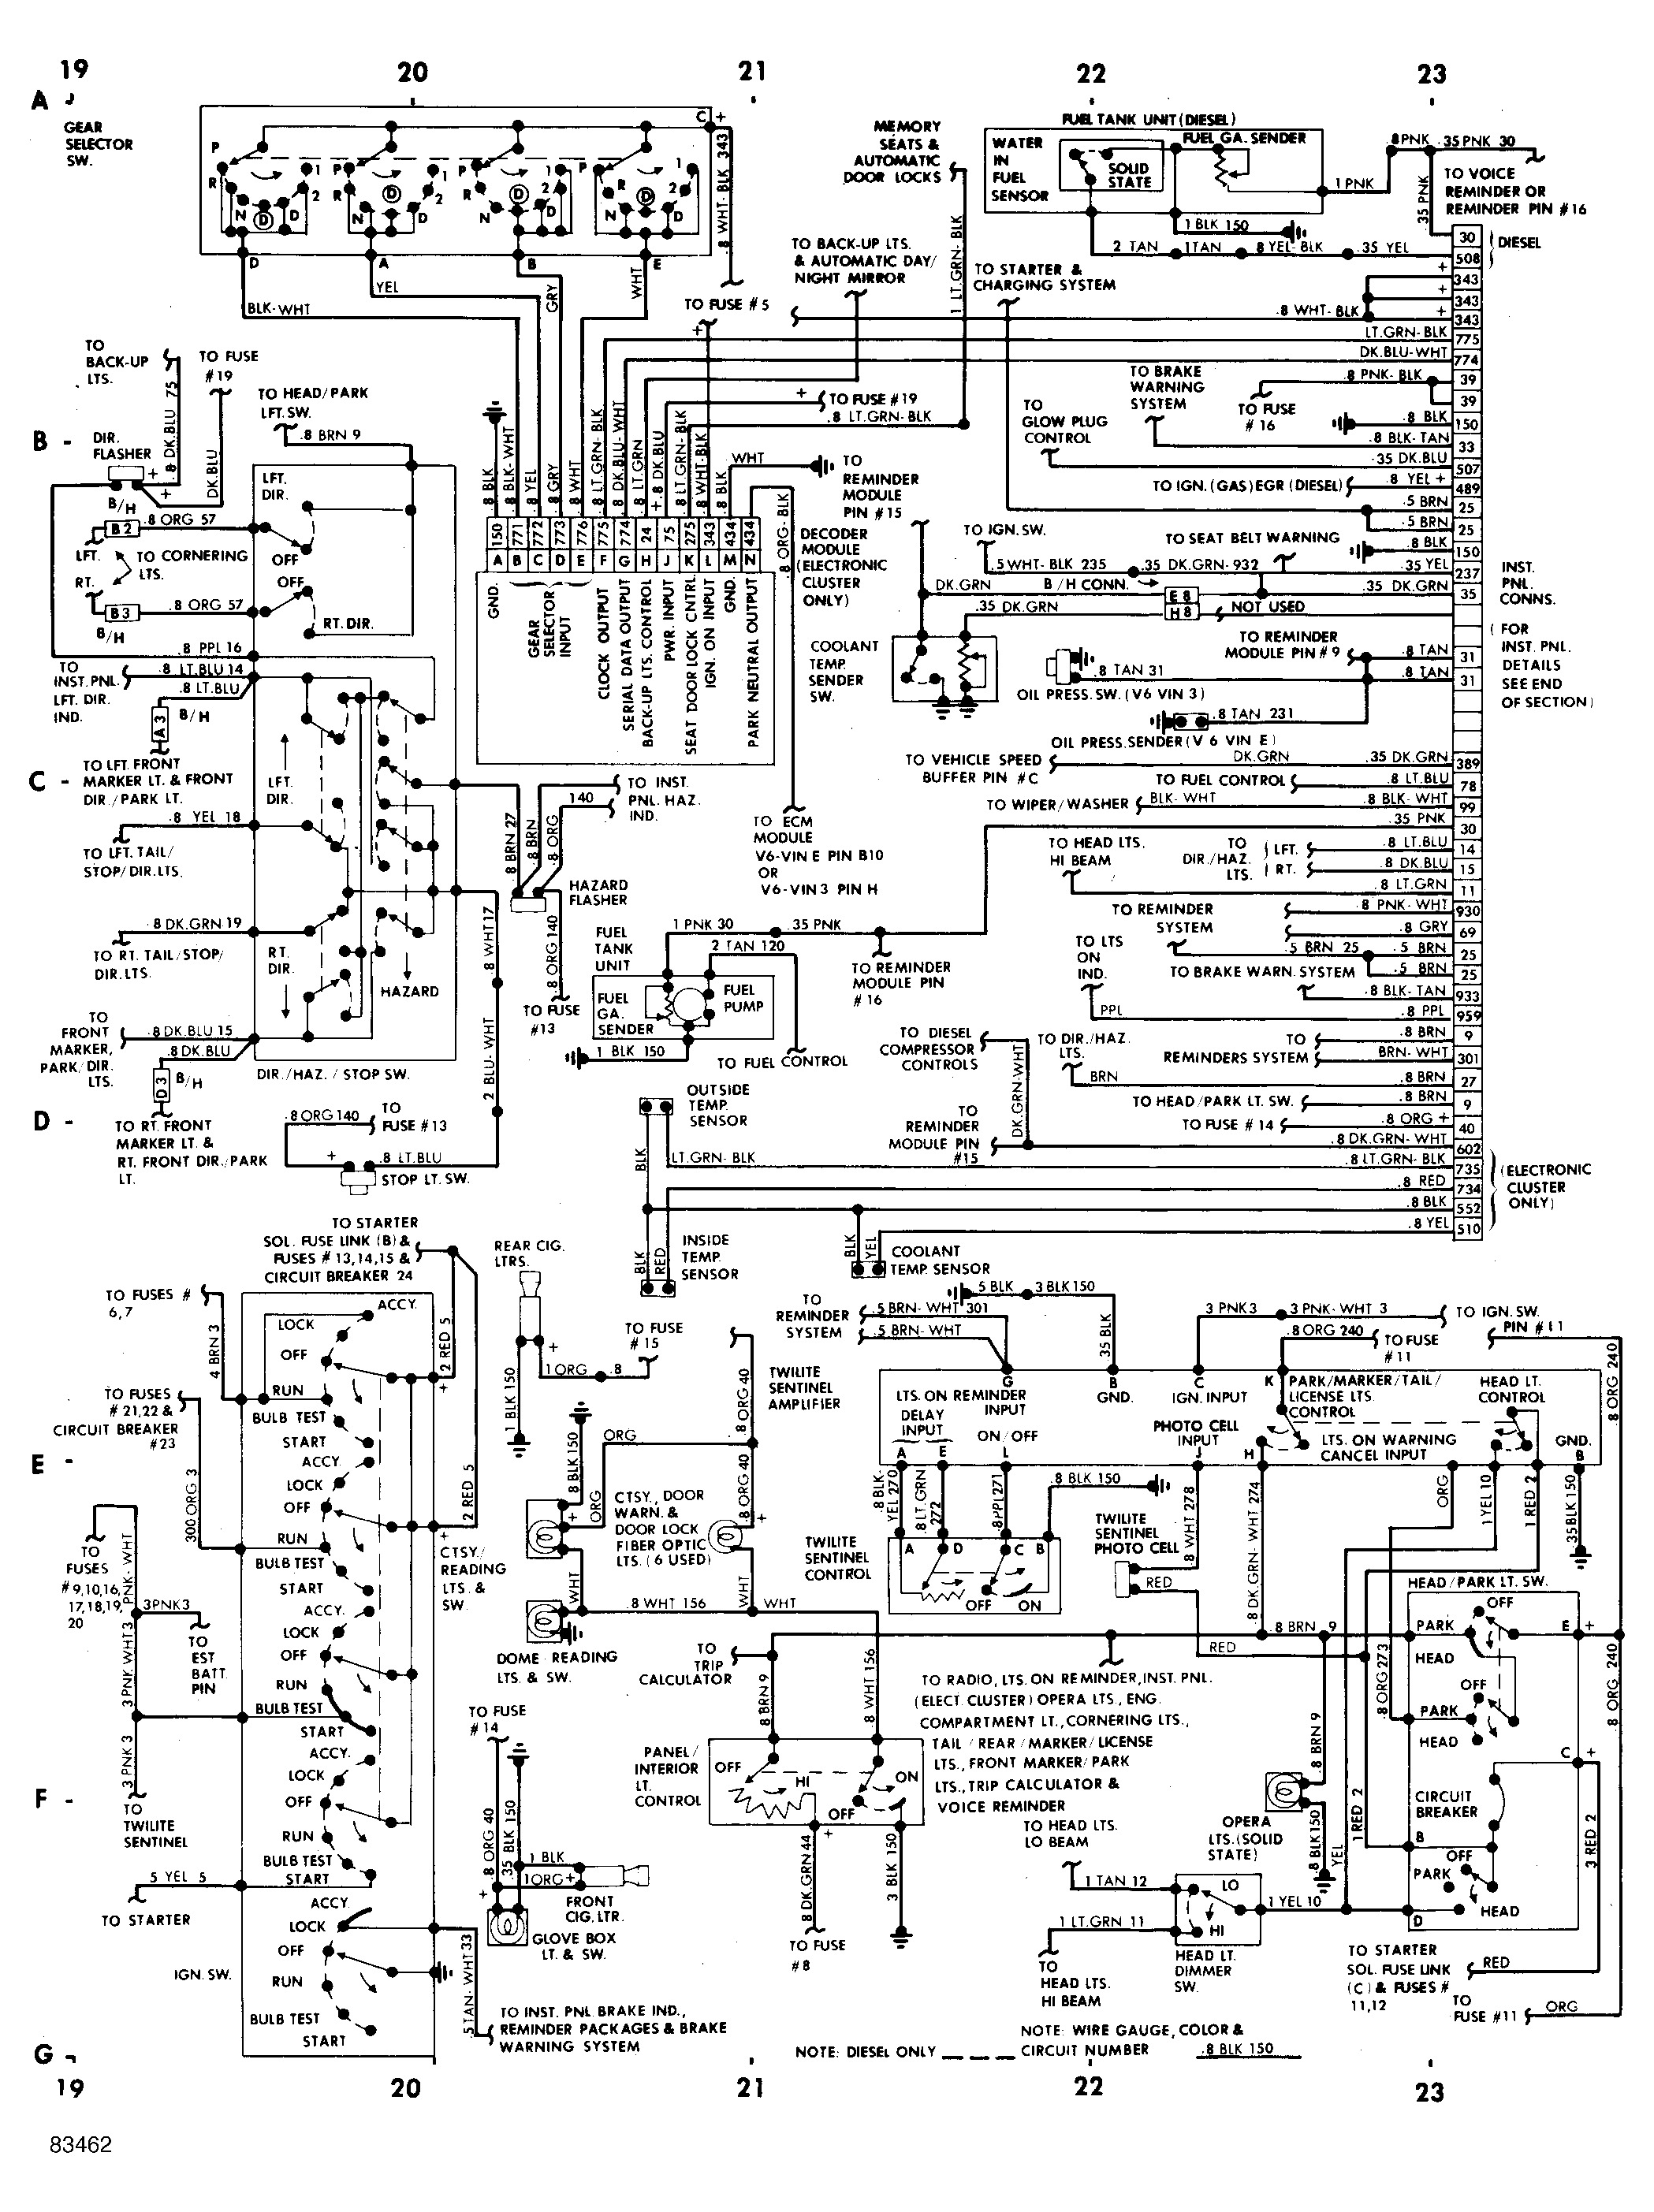 service manual  1985 buick electra manual wiring sch